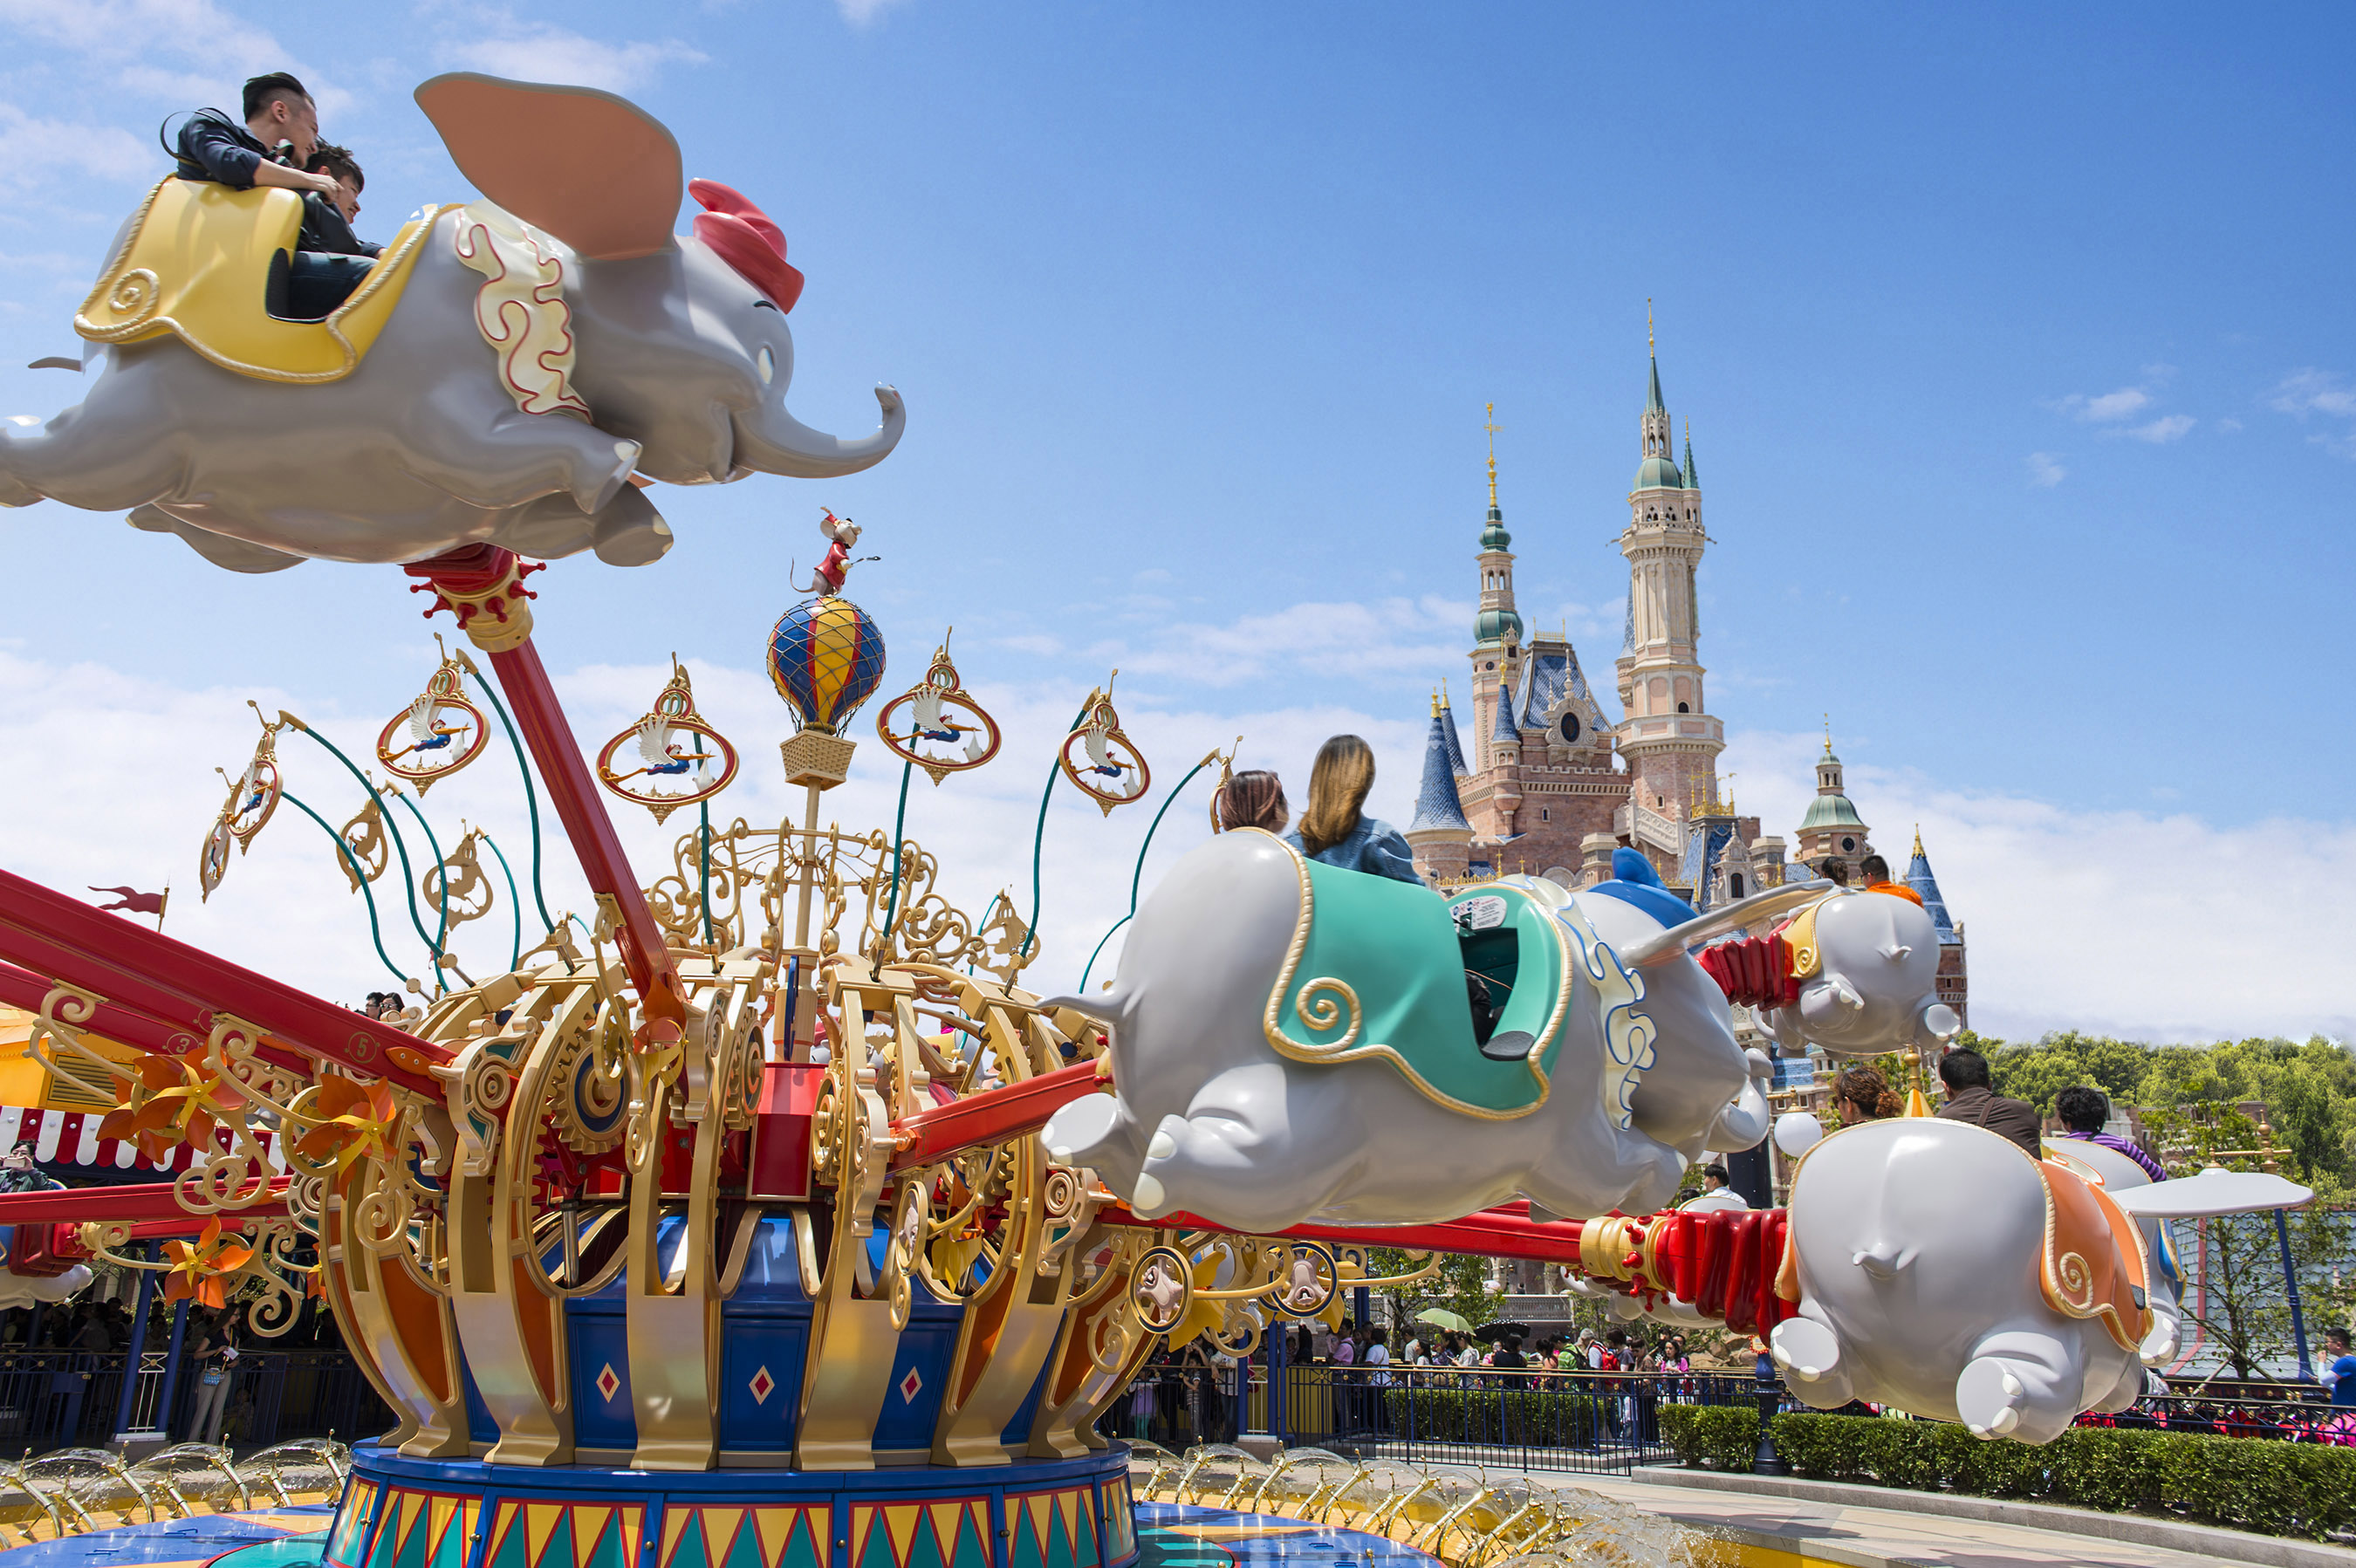 Shanghai Disneyland: A Whole New World of Disney fun